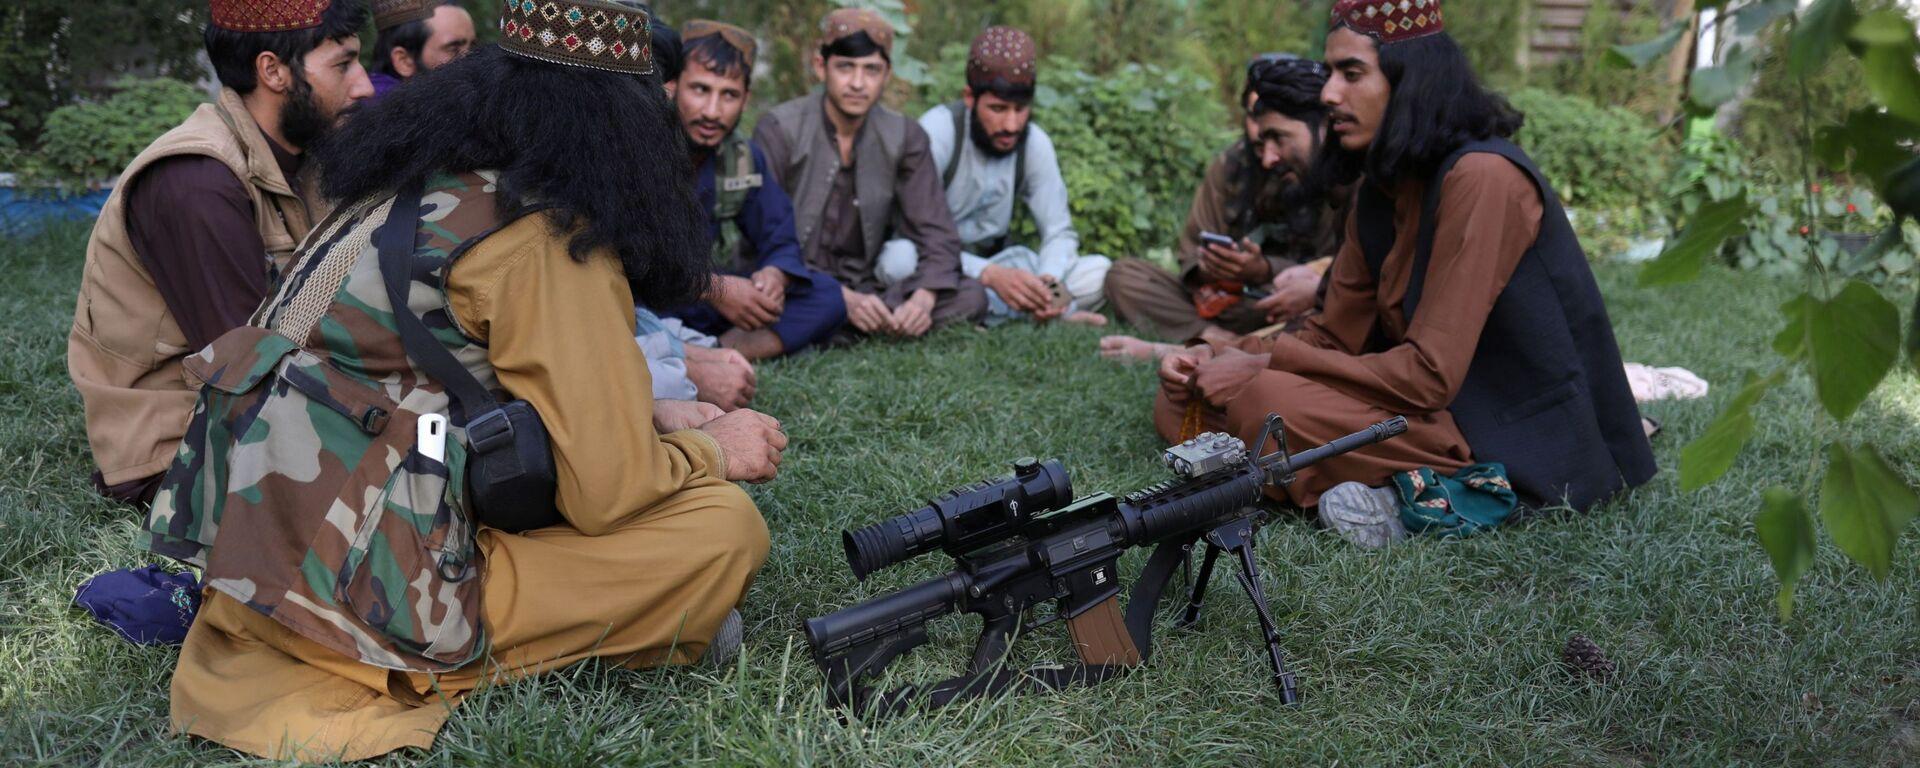 Бойцы Талибана* в парке развлечений в Кабуле  - Sputnik Таджикистан, 1920, 14.09.2021